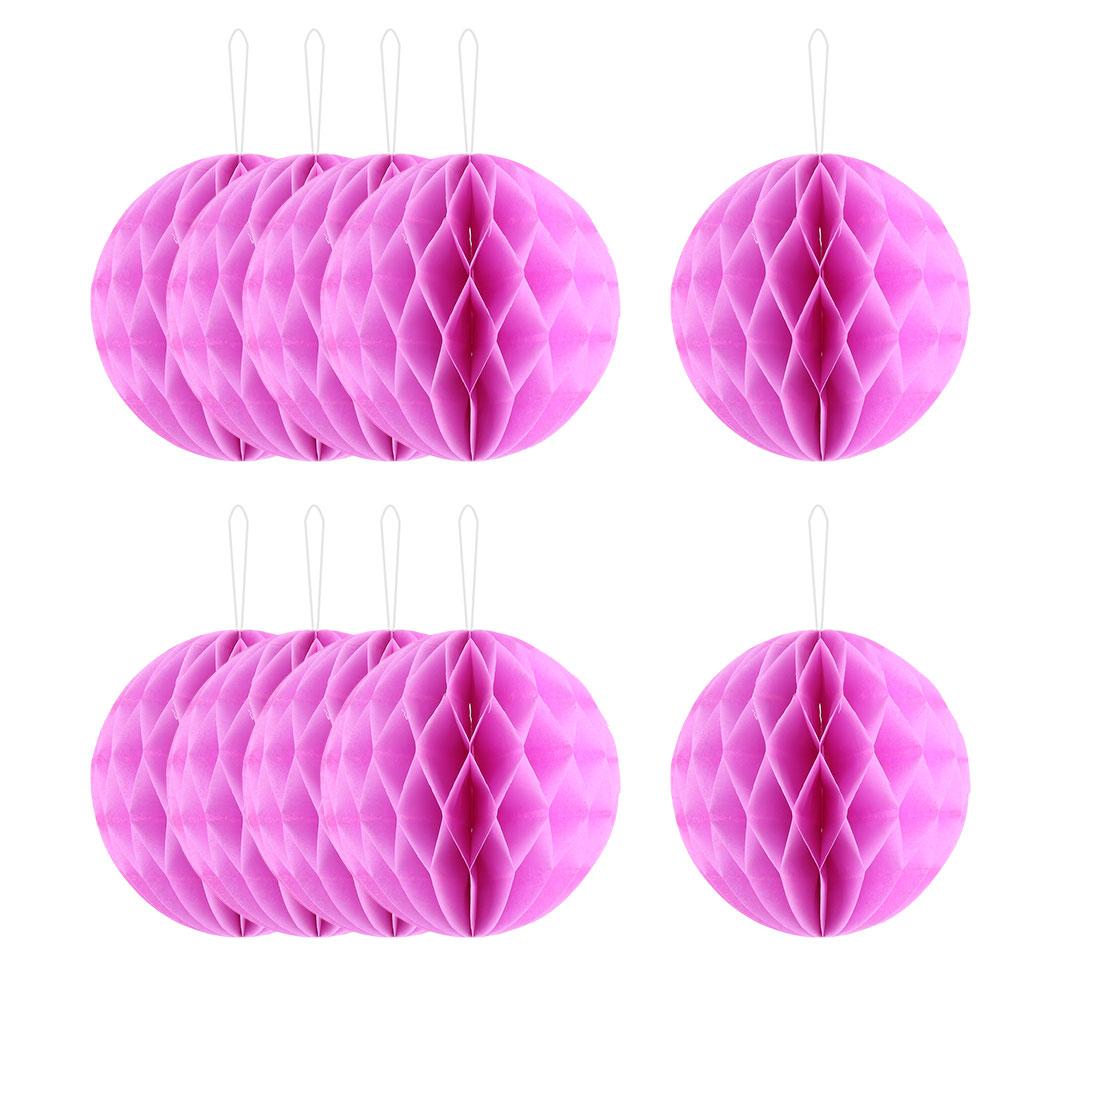 Wedding Party Paper Round Hanging Lantern Lamp Honeycomb Ball Decor Dark Pink 6 Inch Dia 10pcs